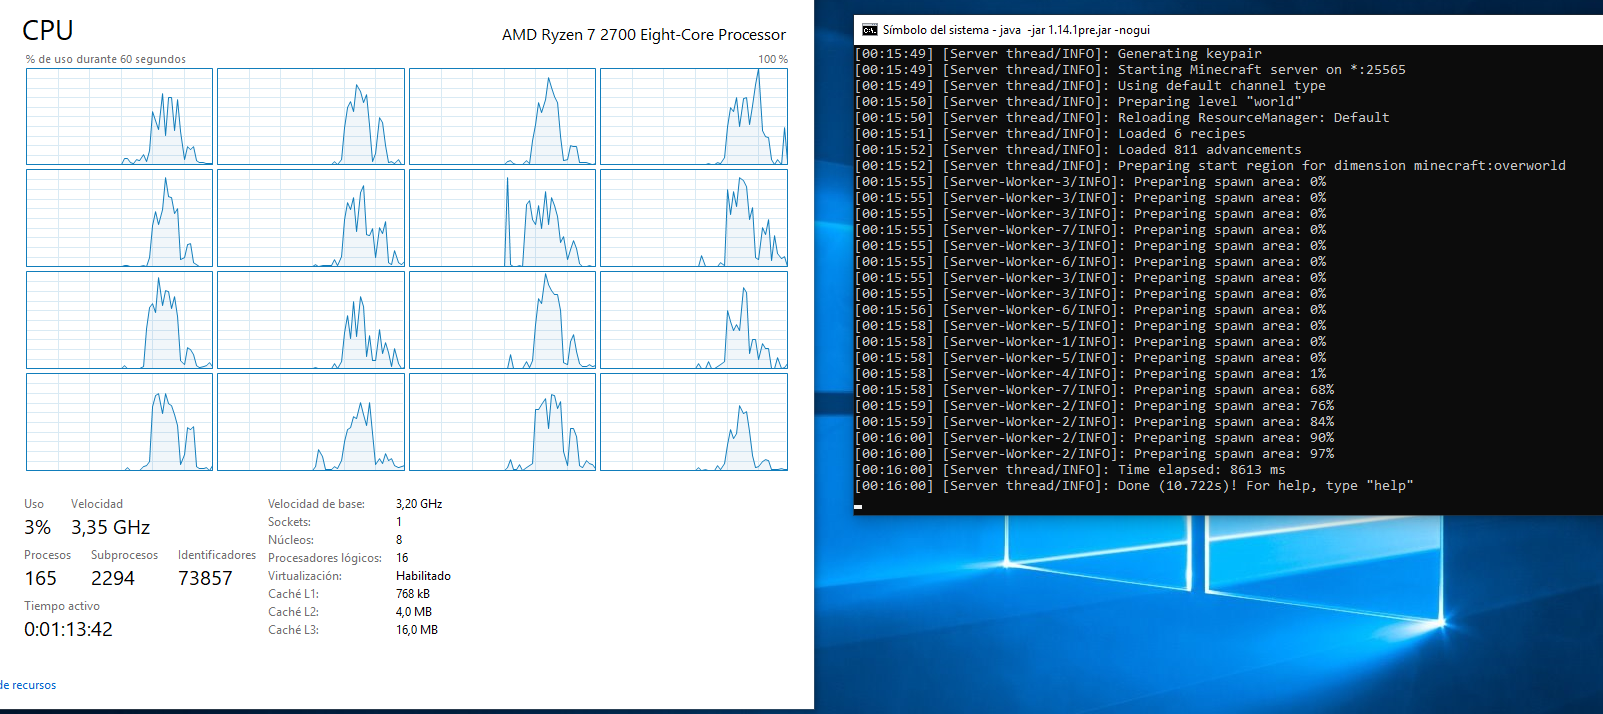 MC-149018] High Idle CPU usage on Server Edition (Minecraft